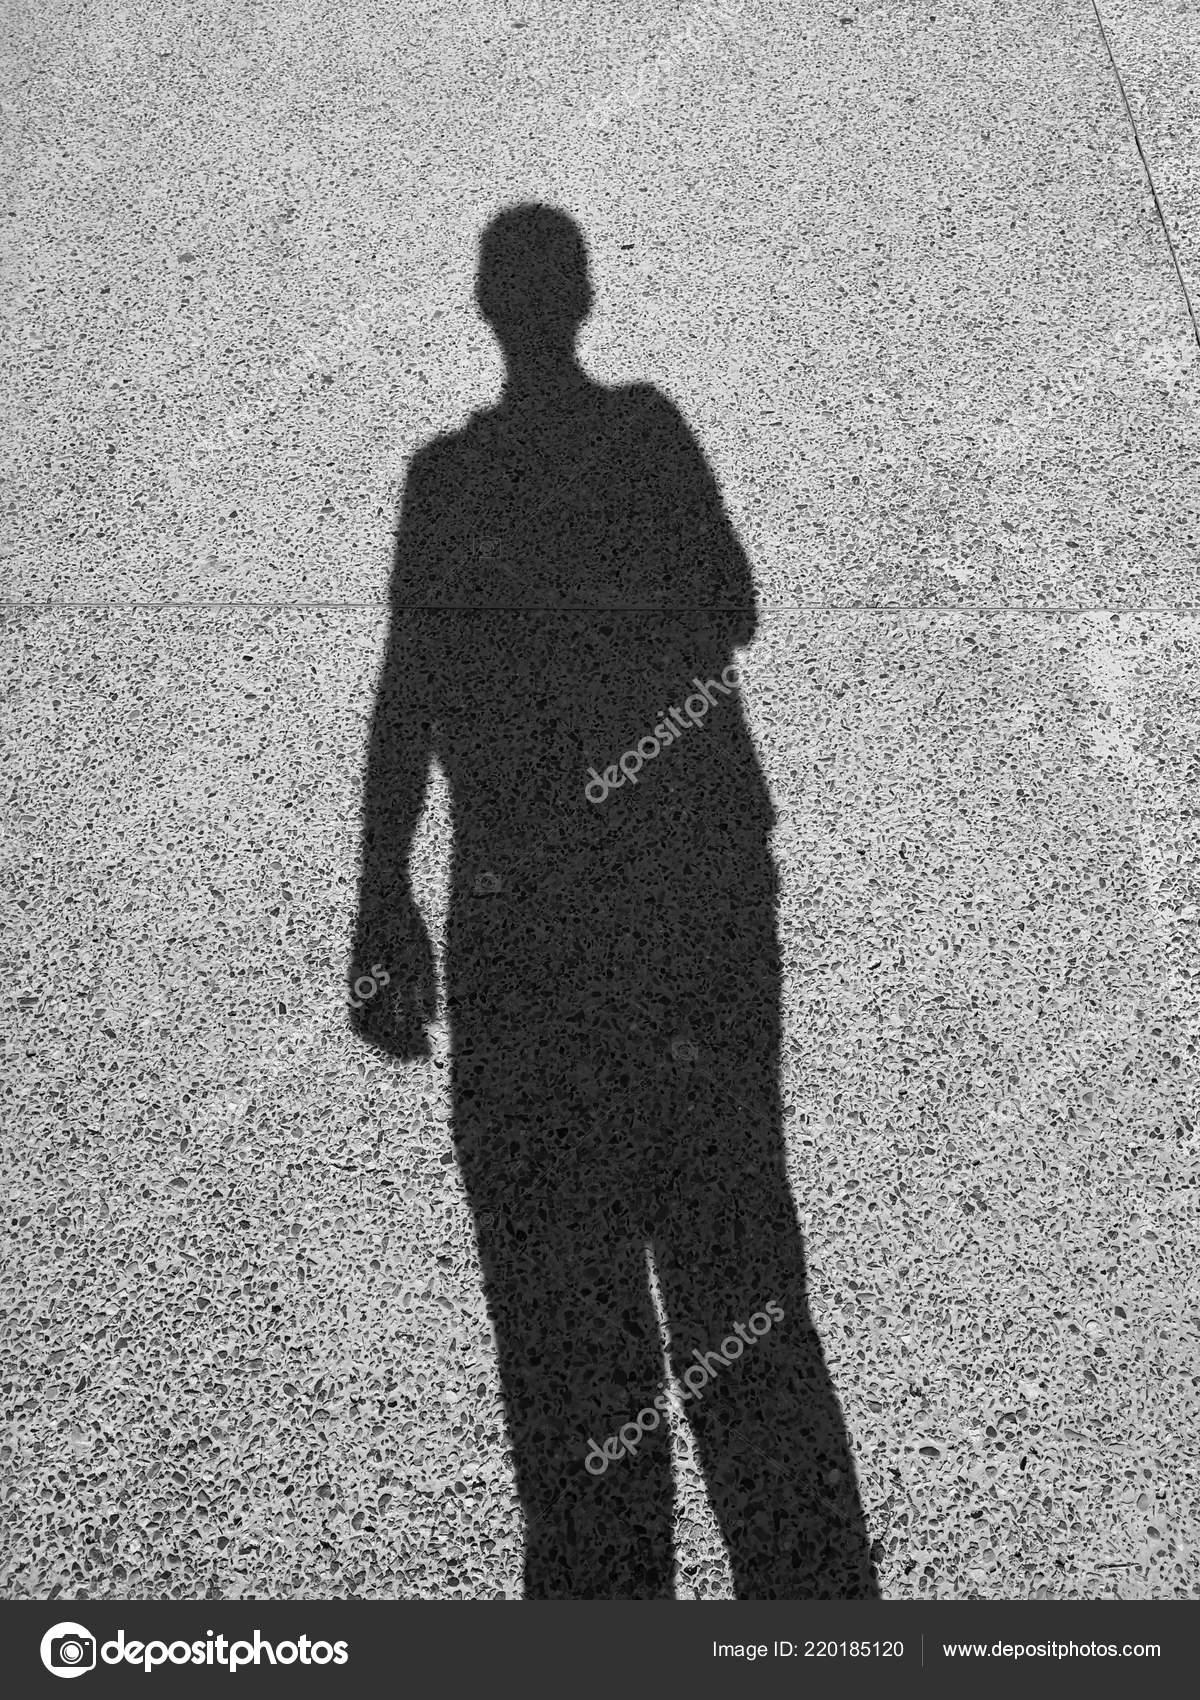 Negro Habia Alargada Sombra Una Persona Piso Grava Silueta Hombre